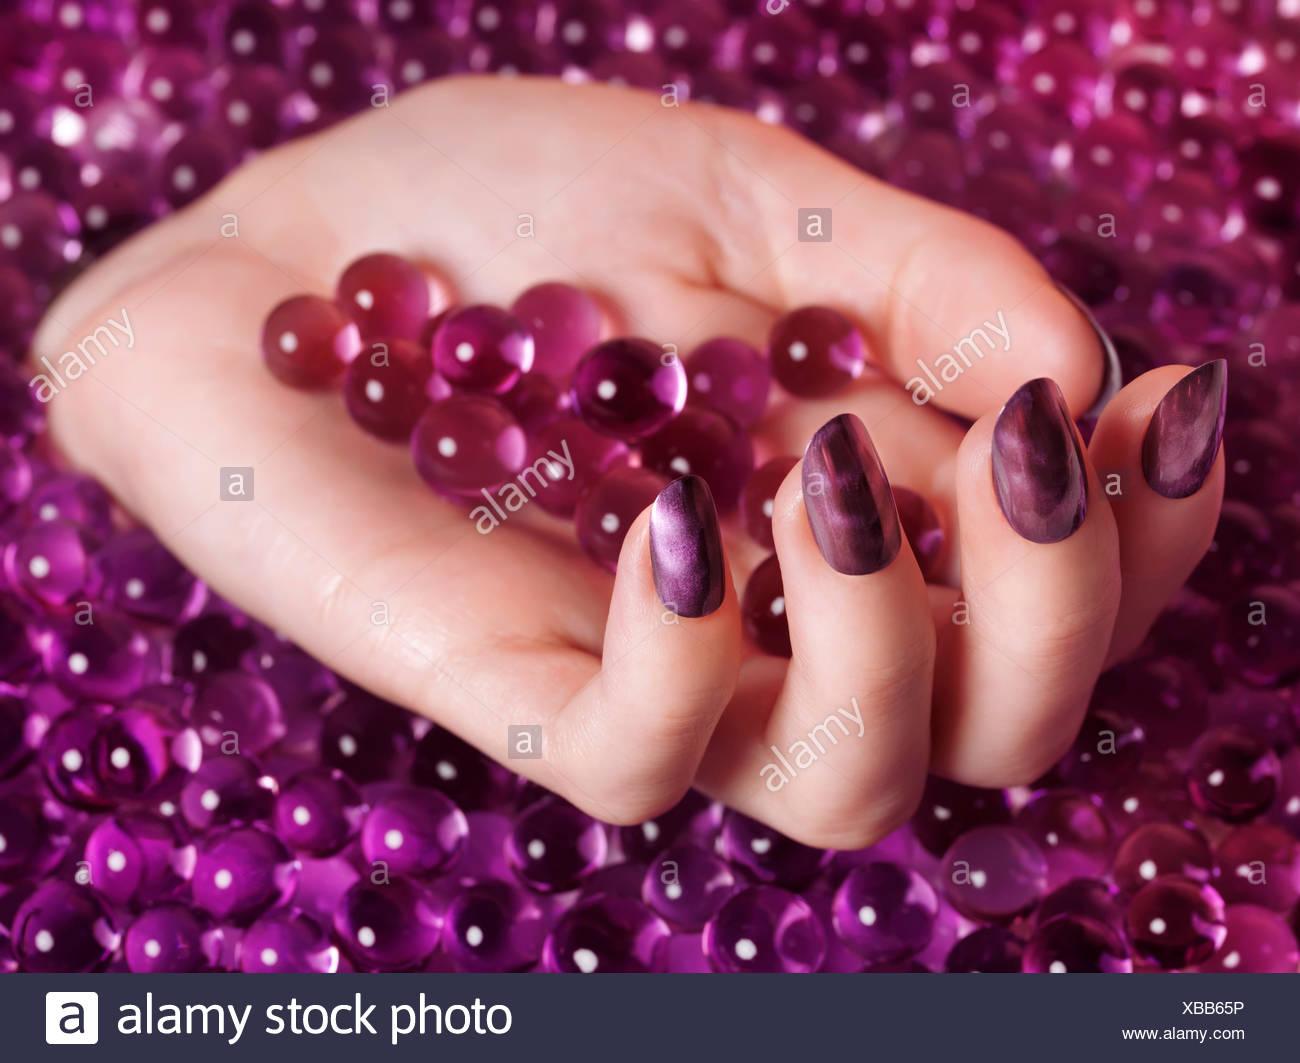 Excepcional Esmalte De Uñas Transparente De Color Púrpura Friso ...